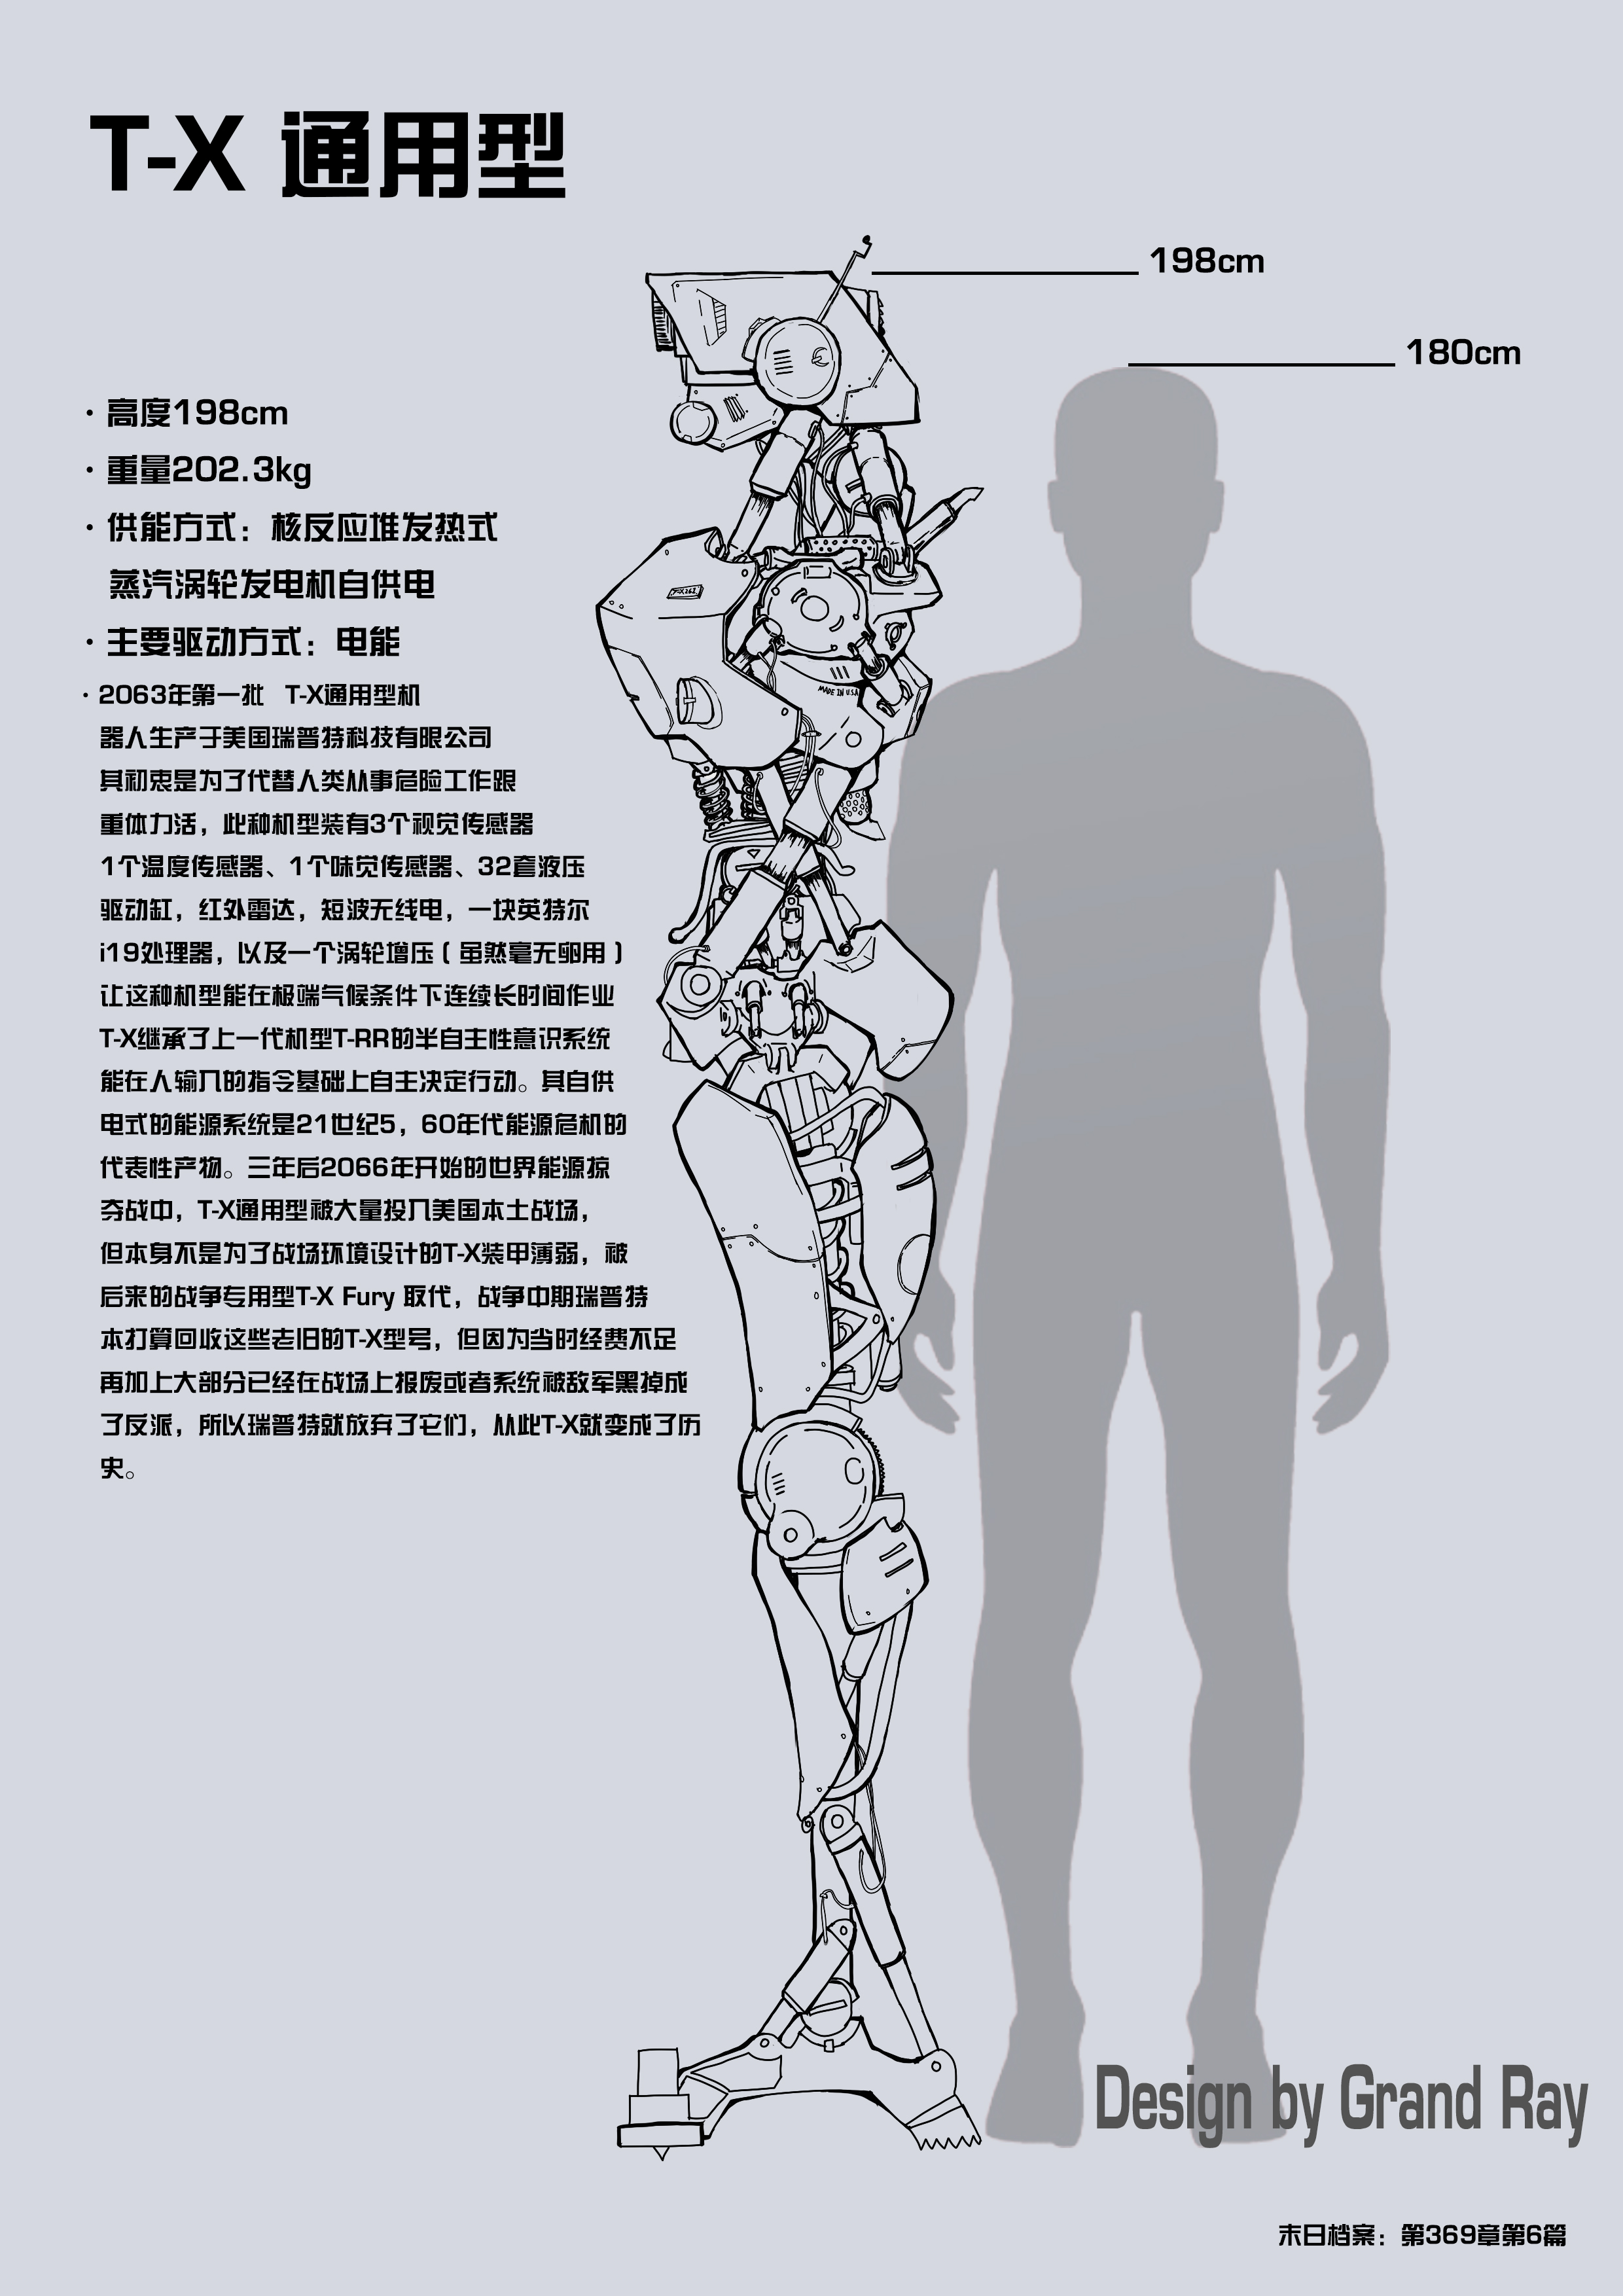 T-X robot design